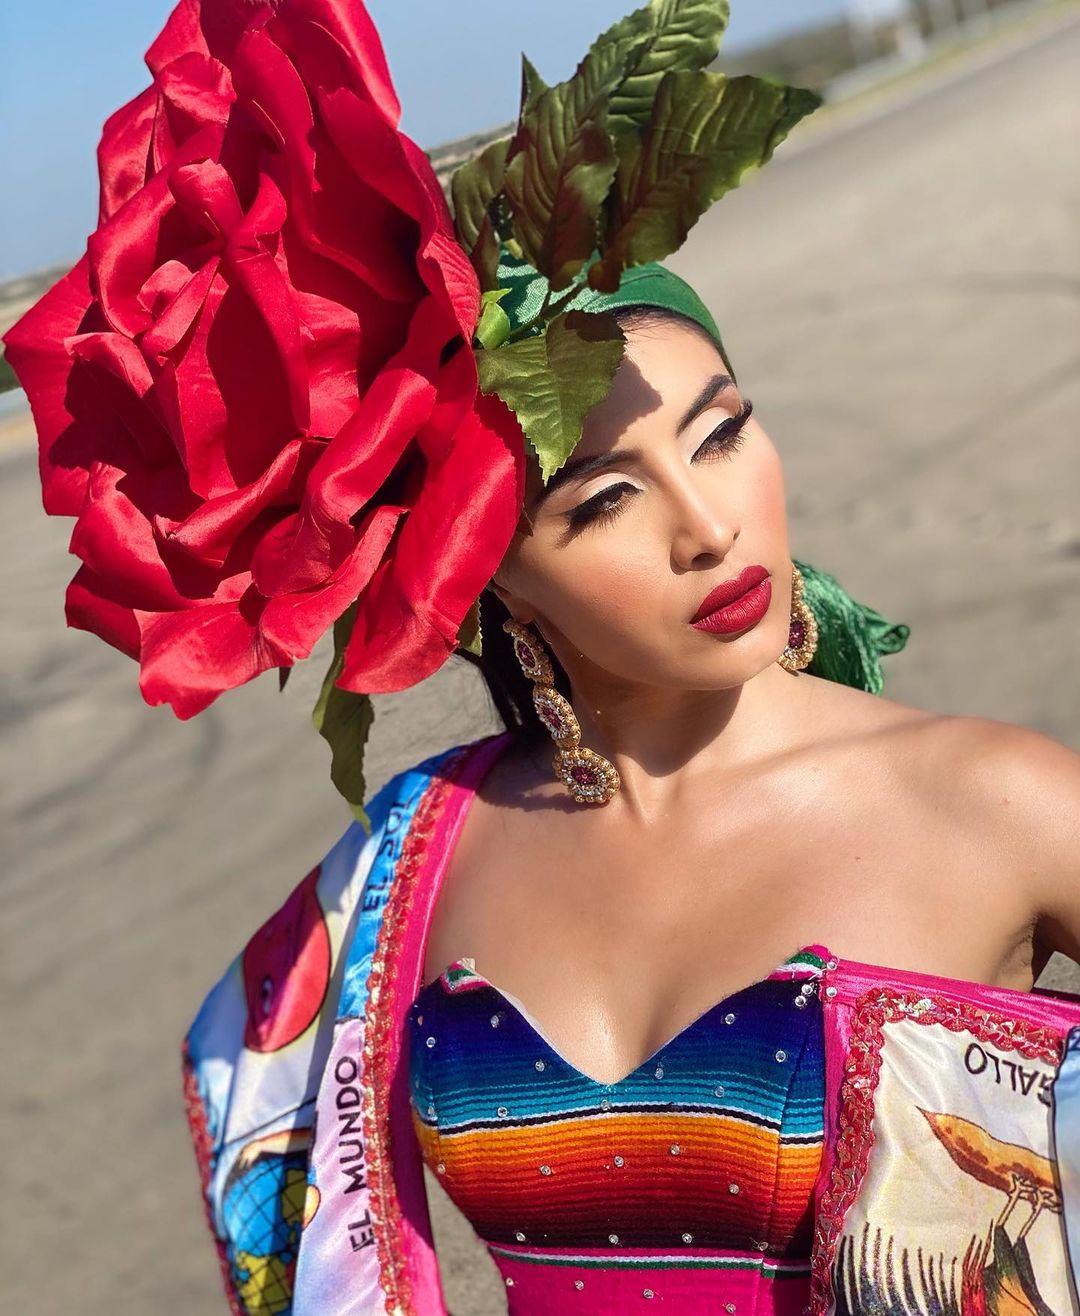 graciela ballesteros, miss earth mexico 2020/top 10 de miss polo international 2019. - Página 2 Gracie28